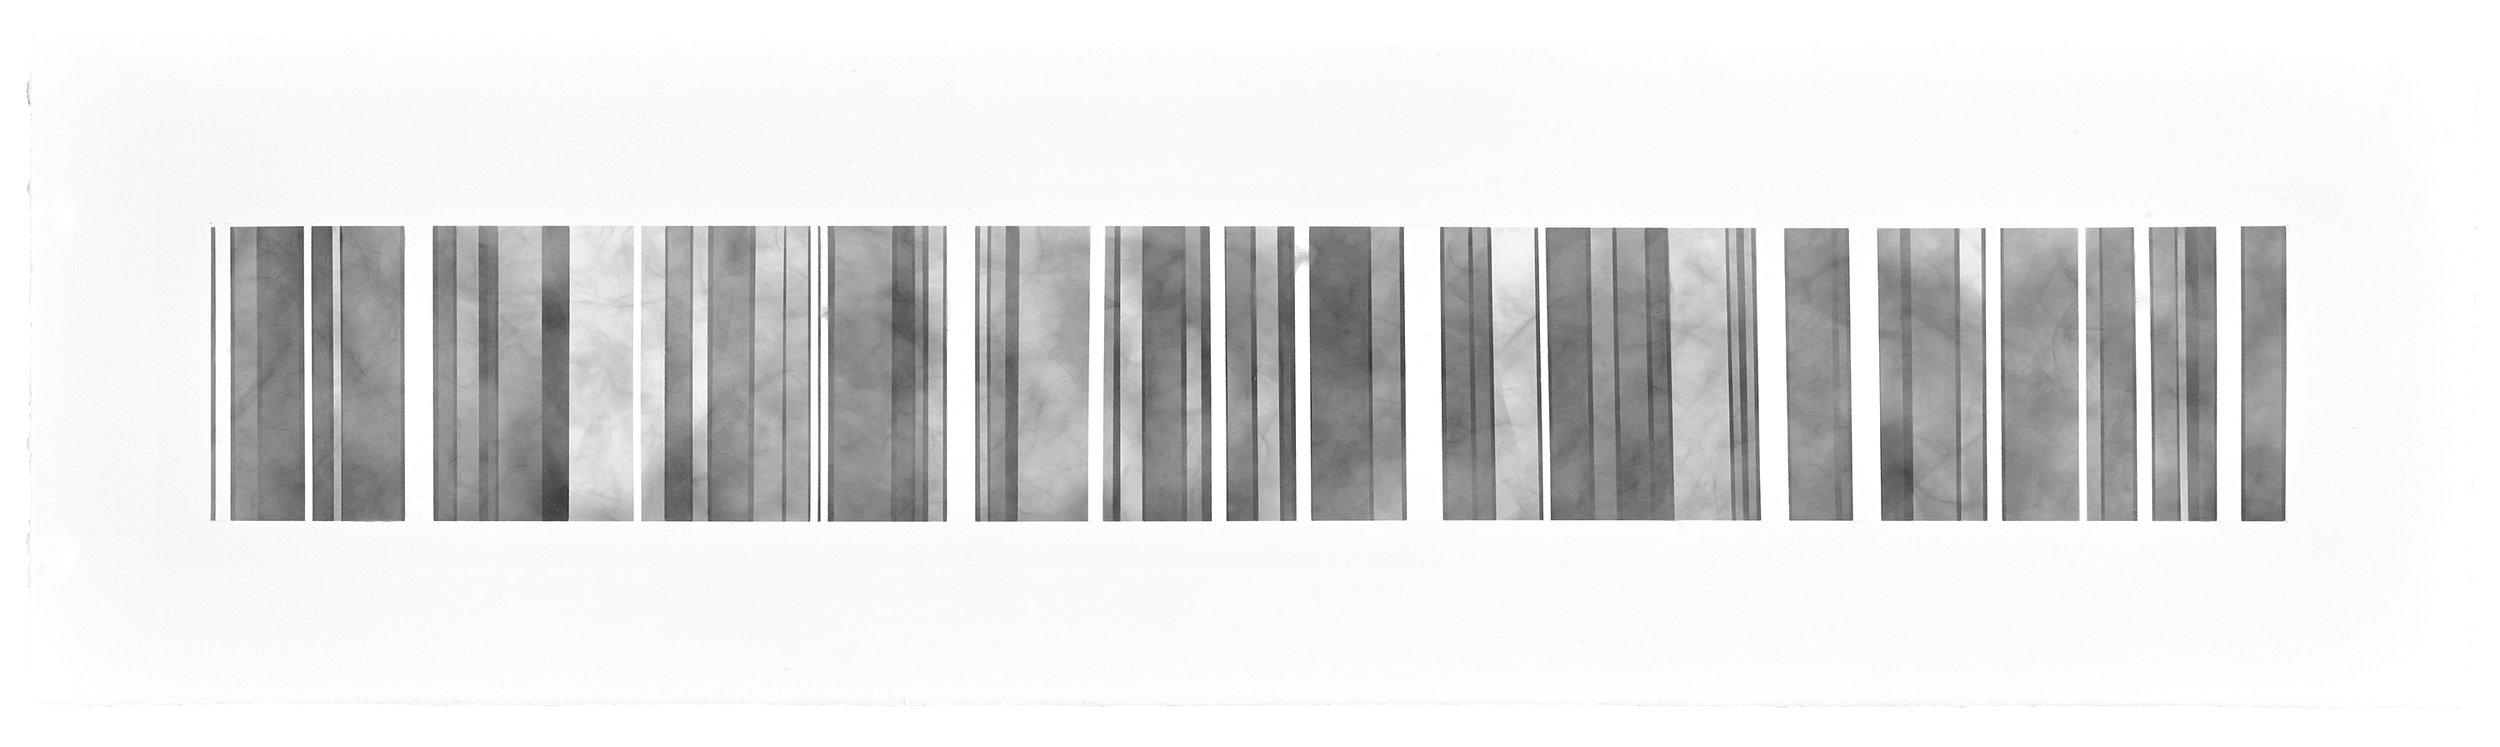 Barcode Series D,7, 2018 copy.jpg